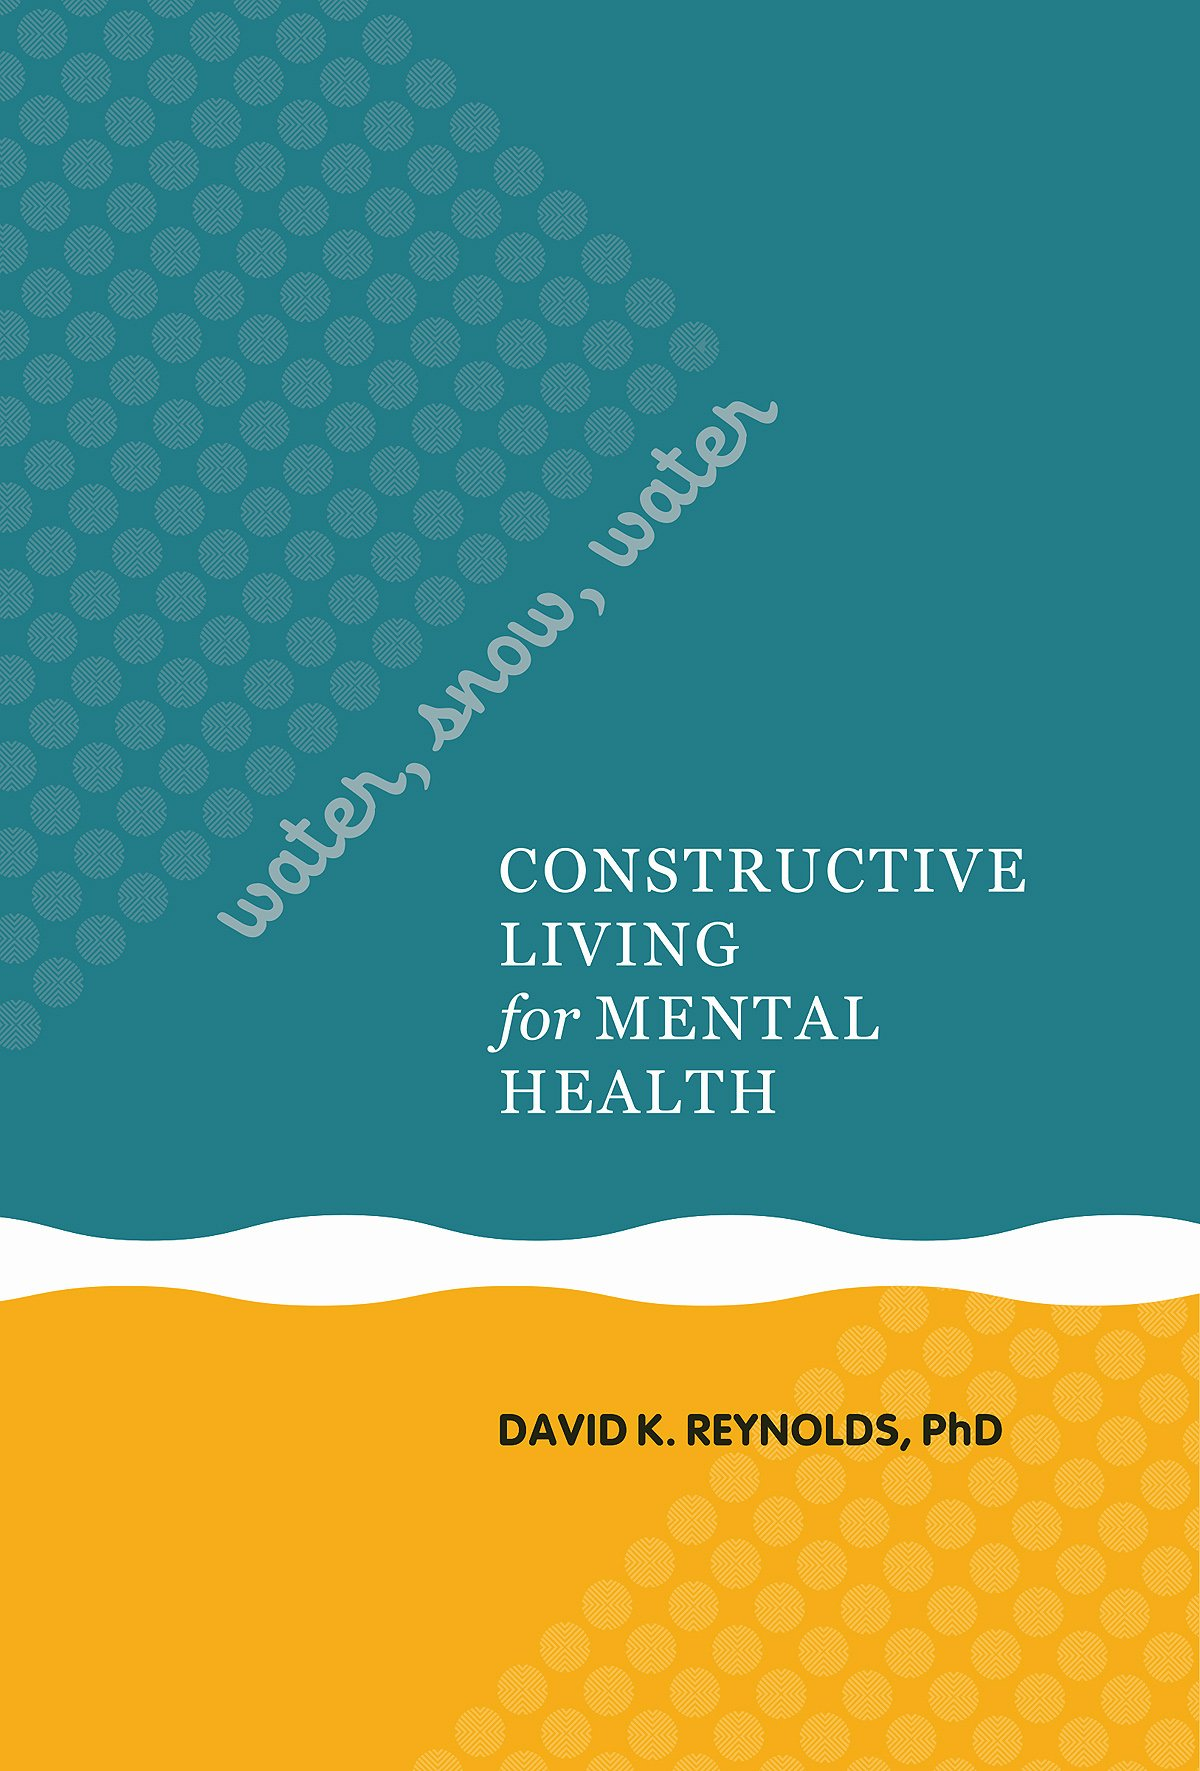 Water, Snow, Water: Constructive Living for Mental Health: David K.  Reynolds: 9780824836955: Amazon.com: Books